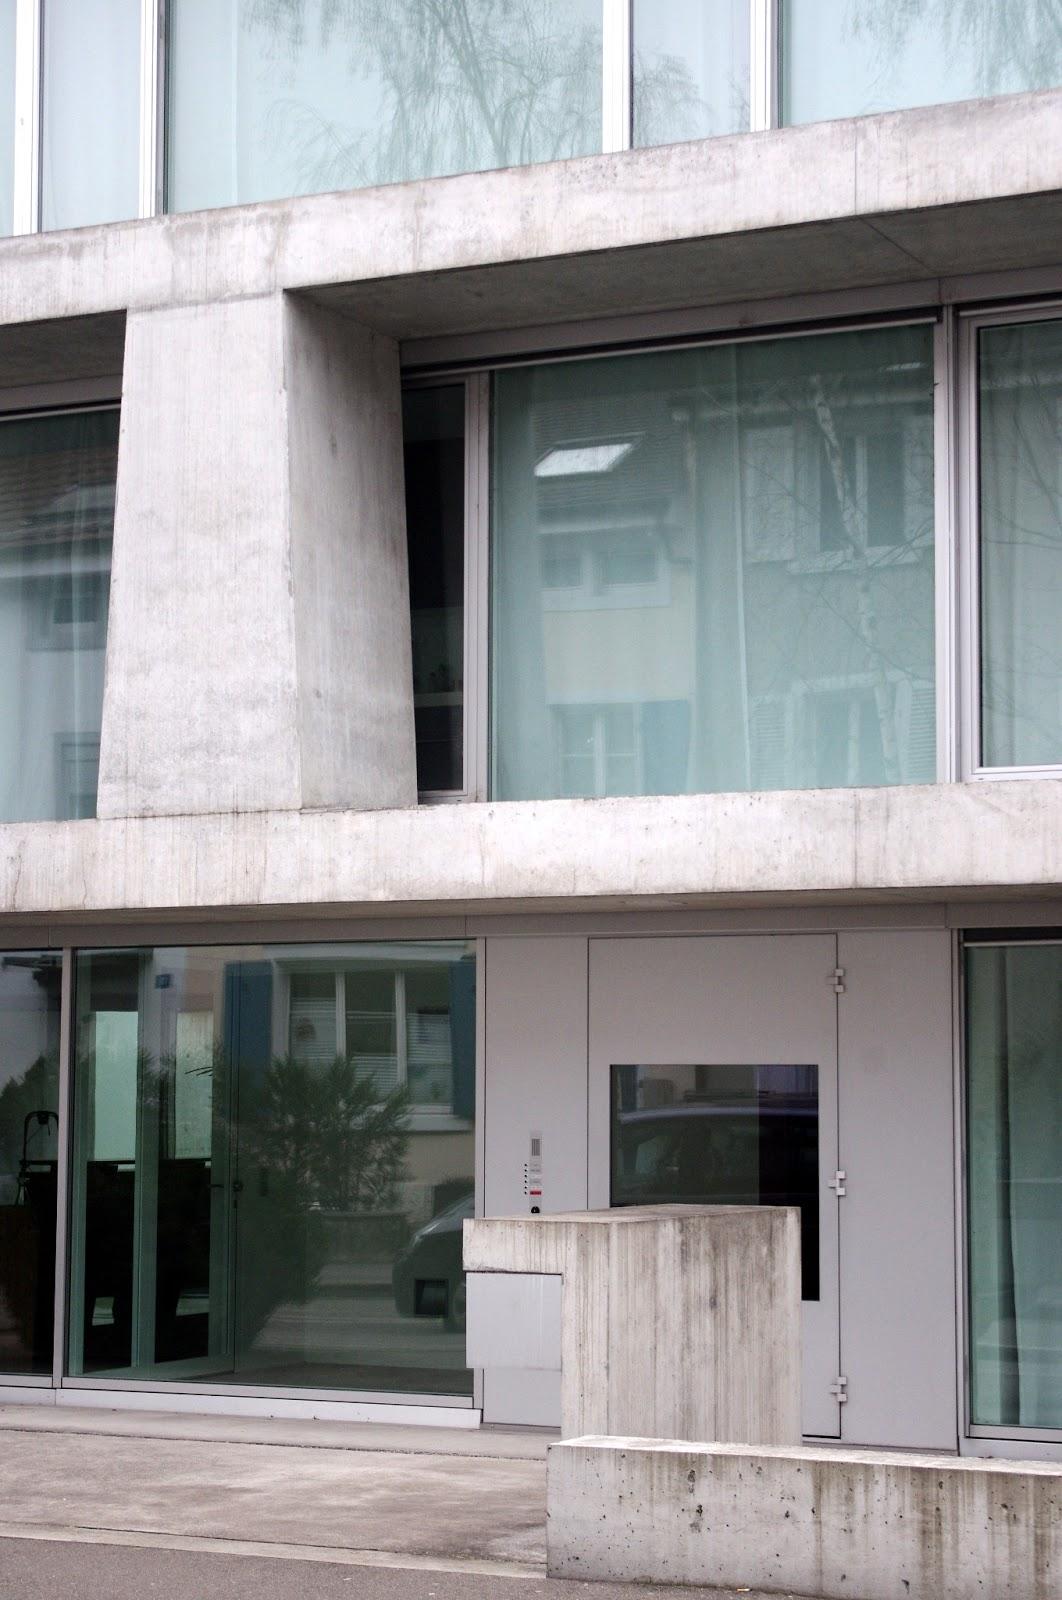 M2c blog residential building by silvia gm r reto gm r architekten basel - Gmur architekten ...